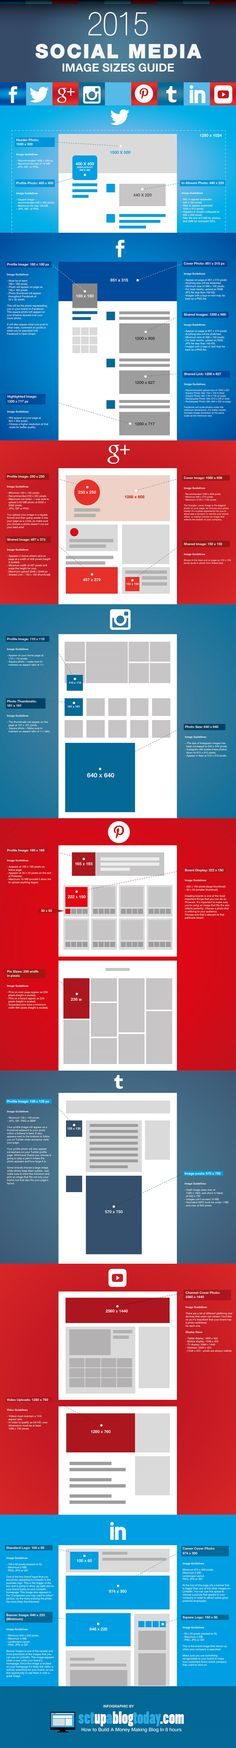 [Cool Infographic Friday] 2015 Social Media Image Sizes - SocialFish